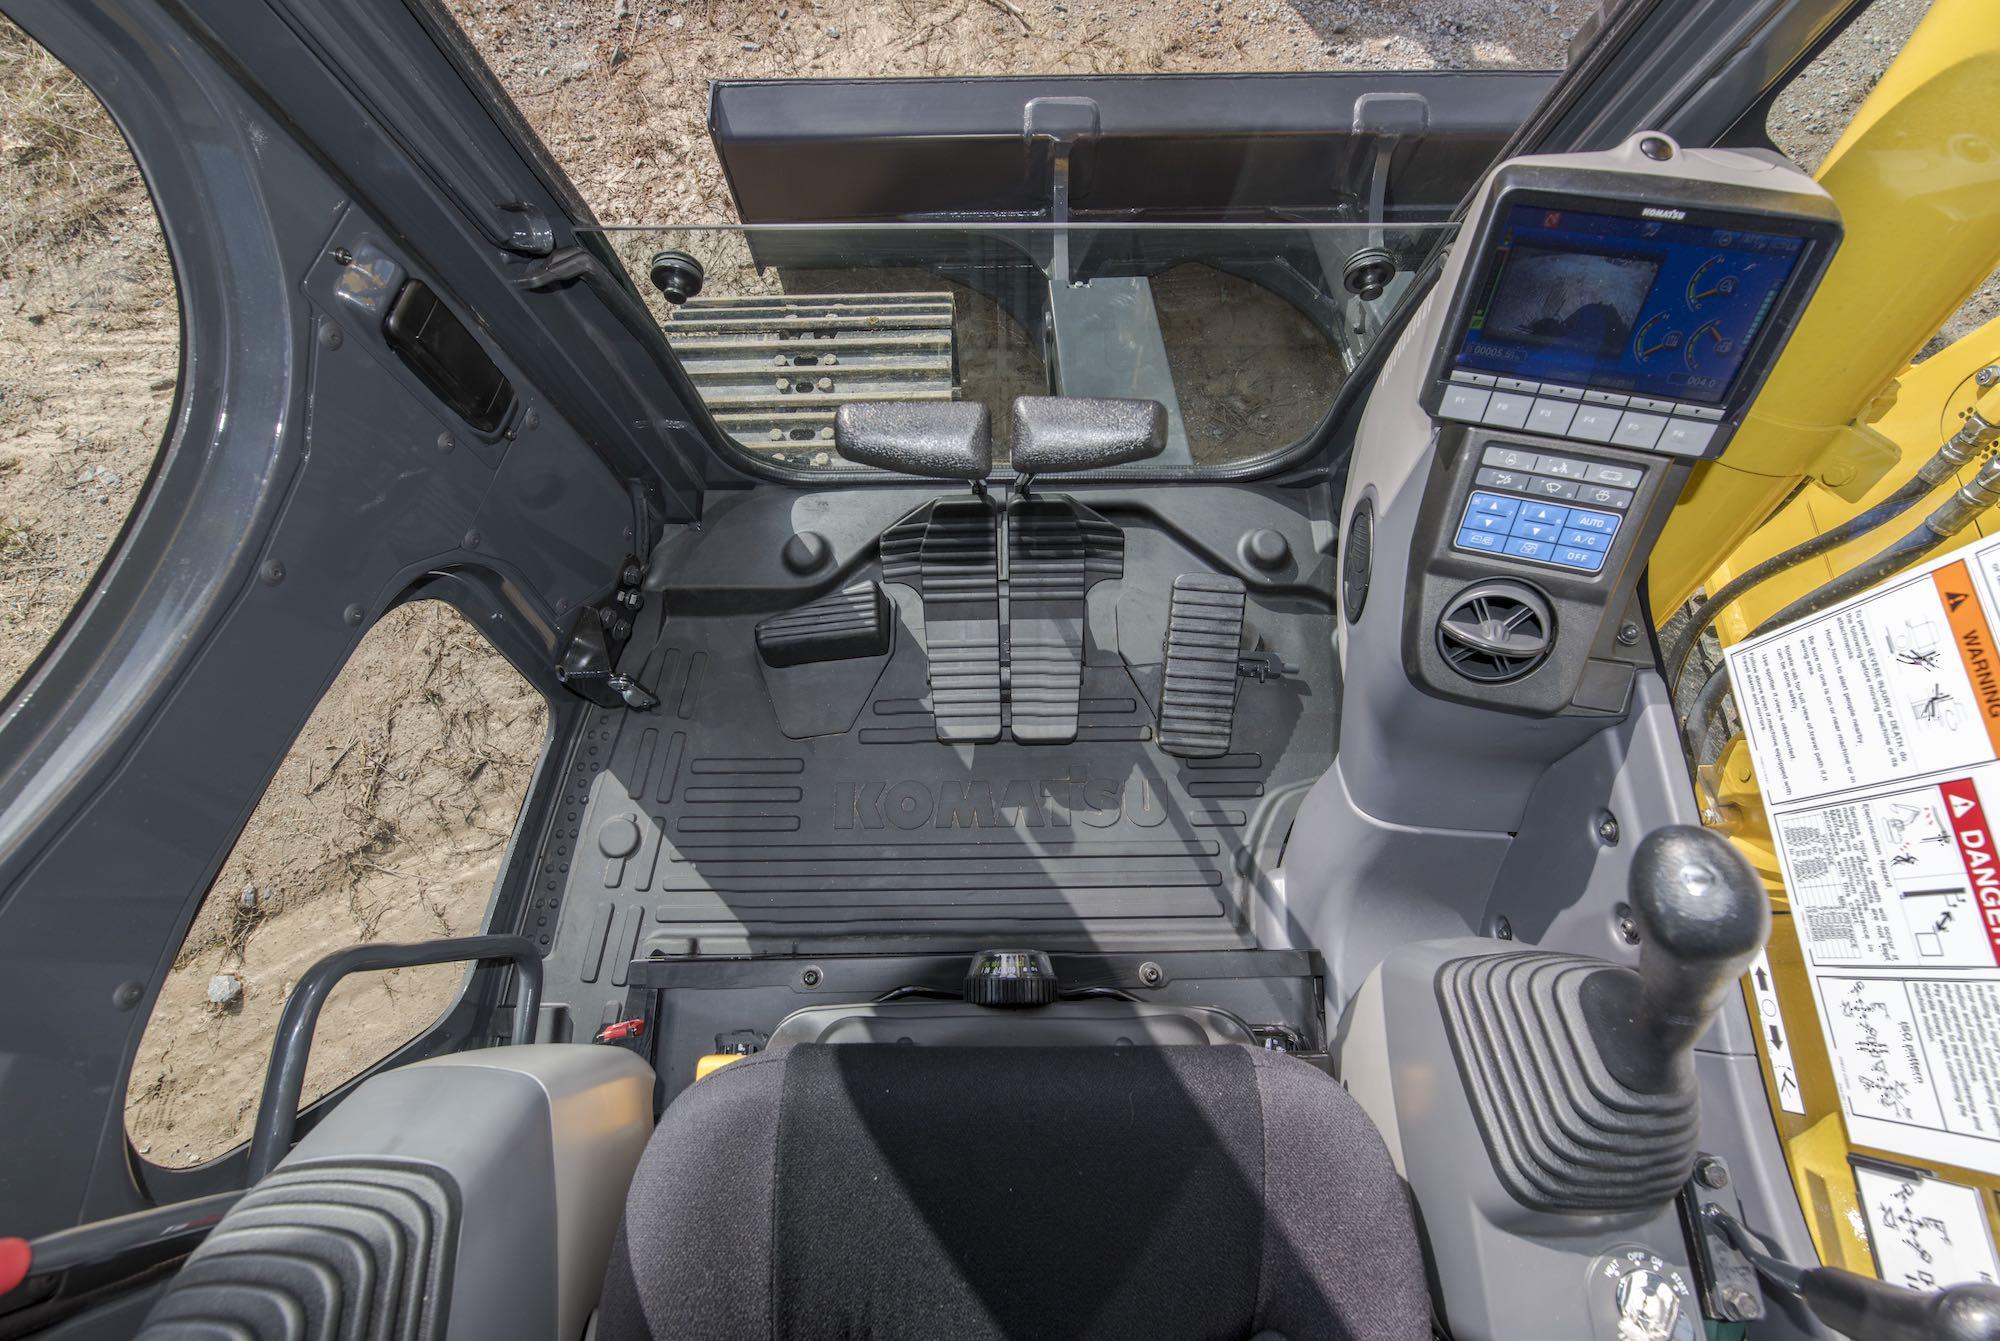 Komatsu Intros Pc138uslc 11 Excavator With Performance